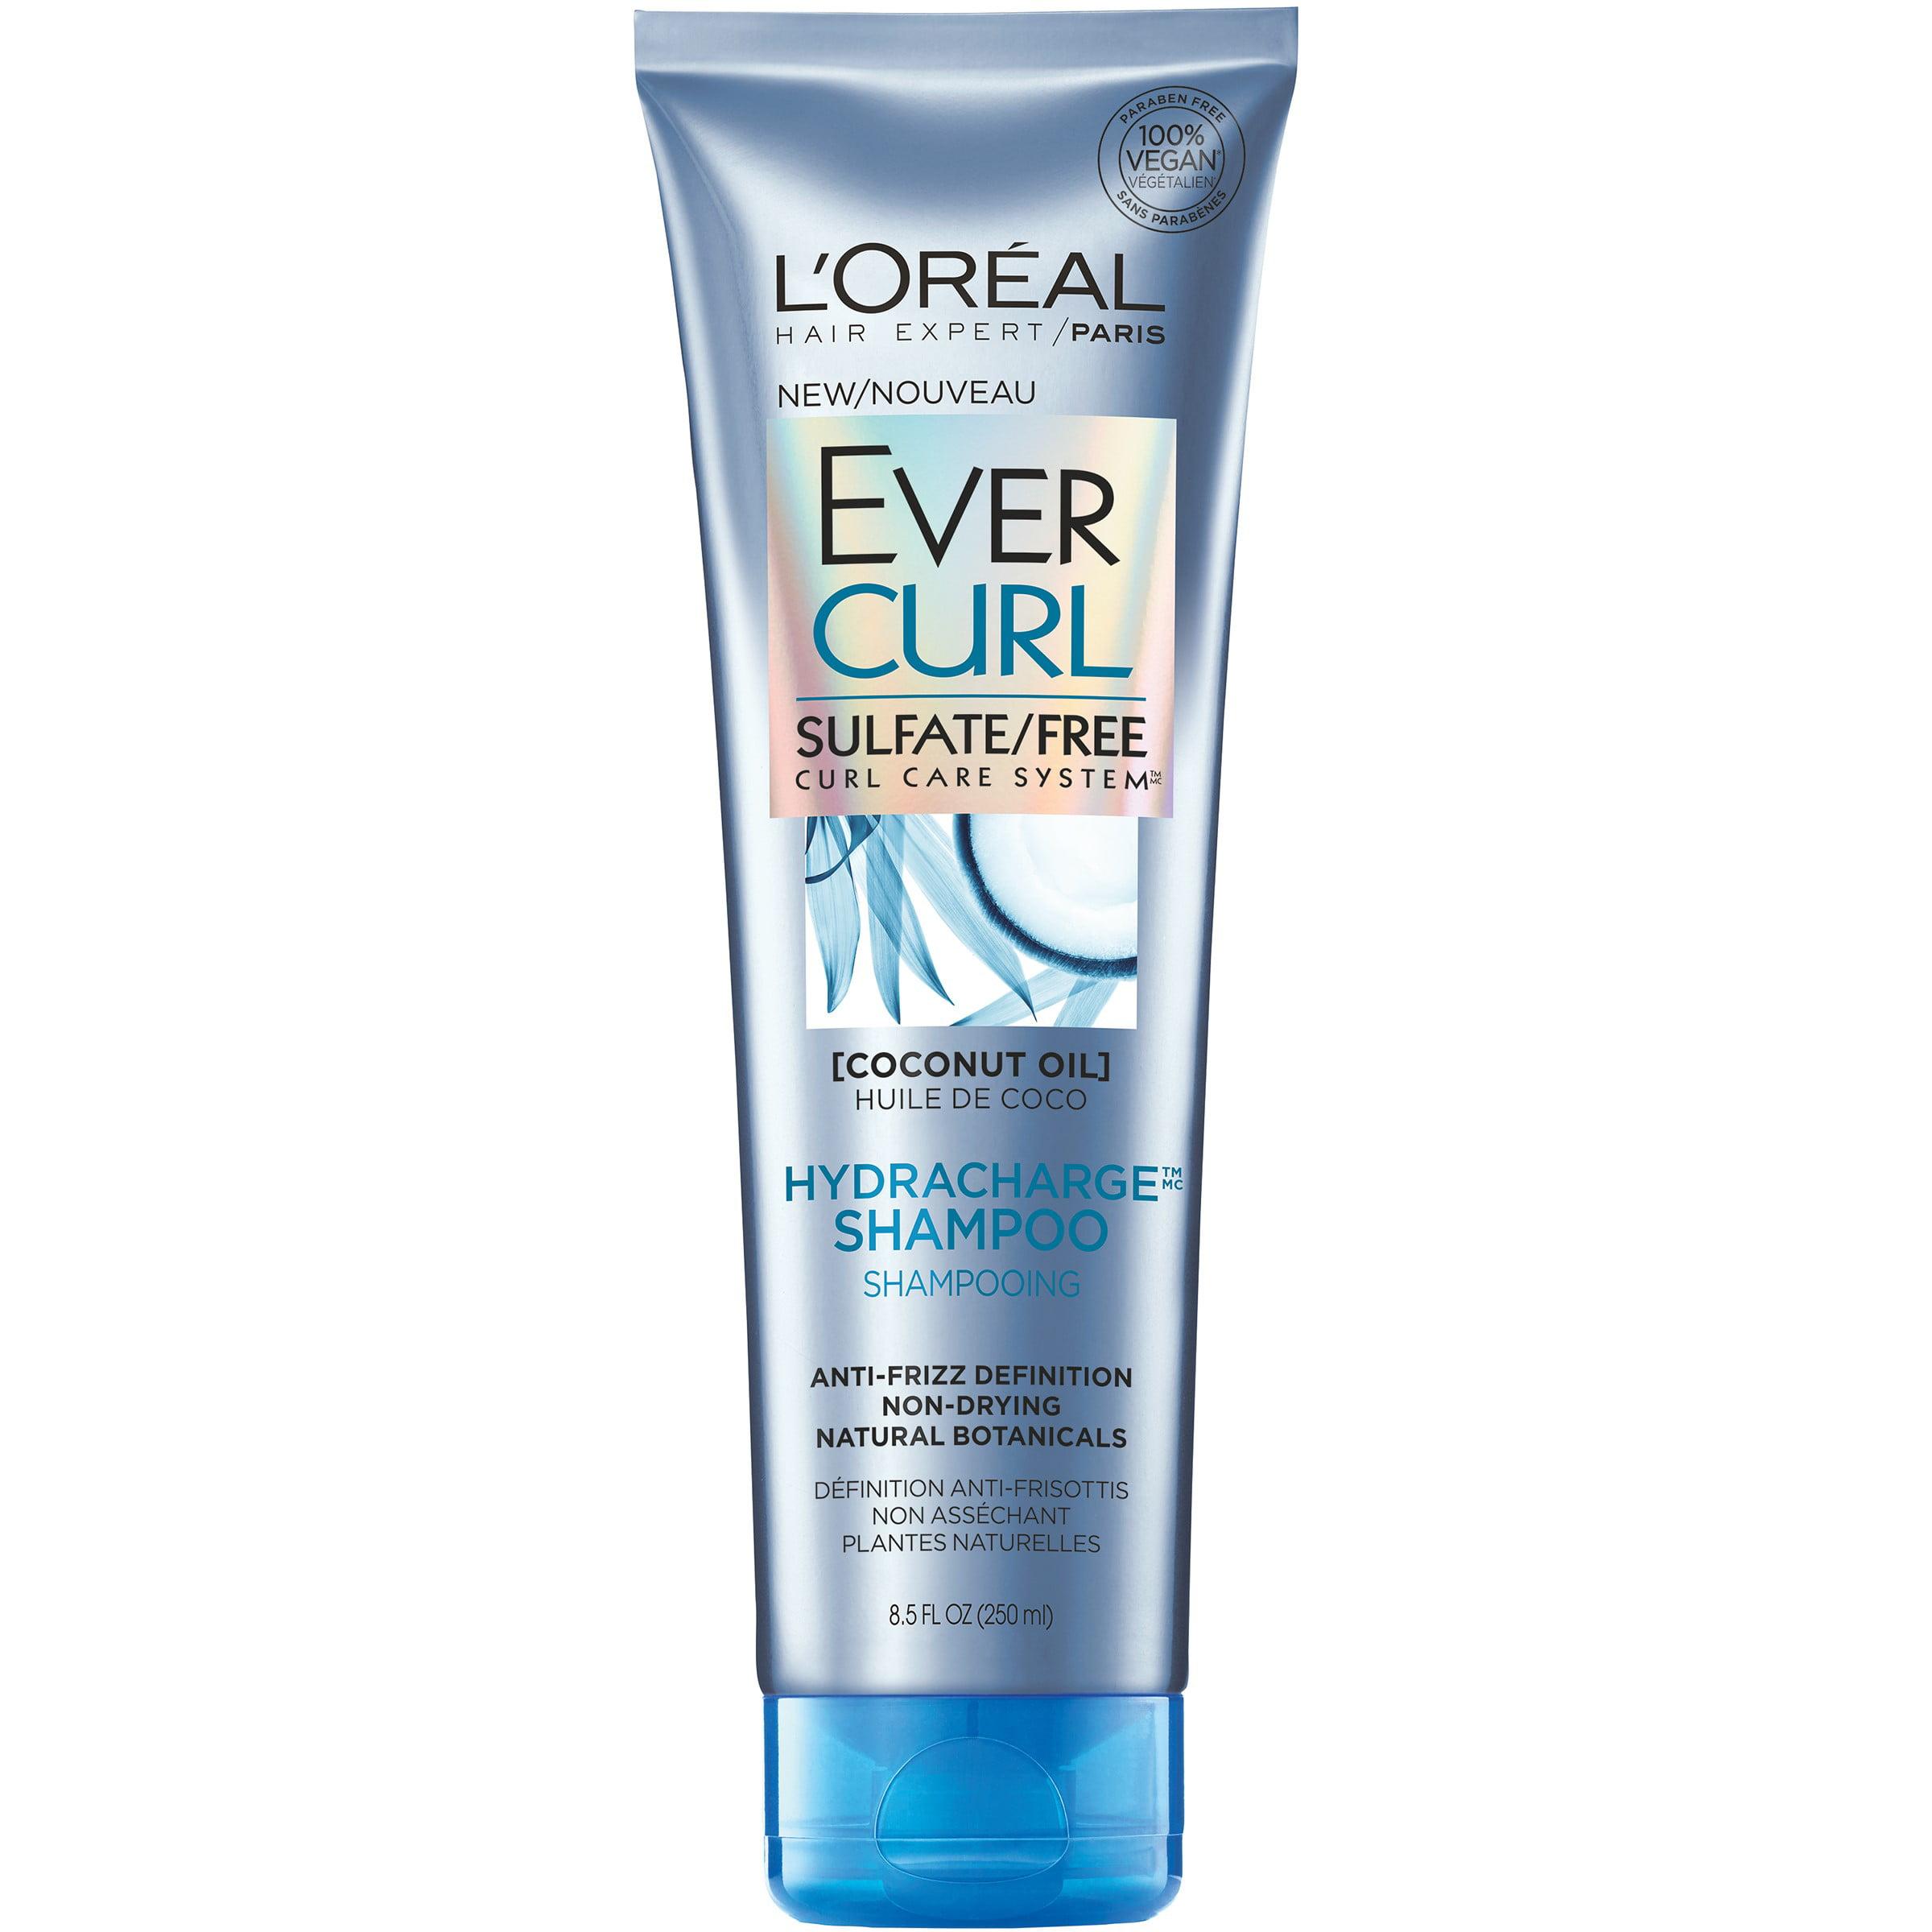 L'Oreal Paris EverCurl HydraCharge Shampoo, 8.5 Fl Oz